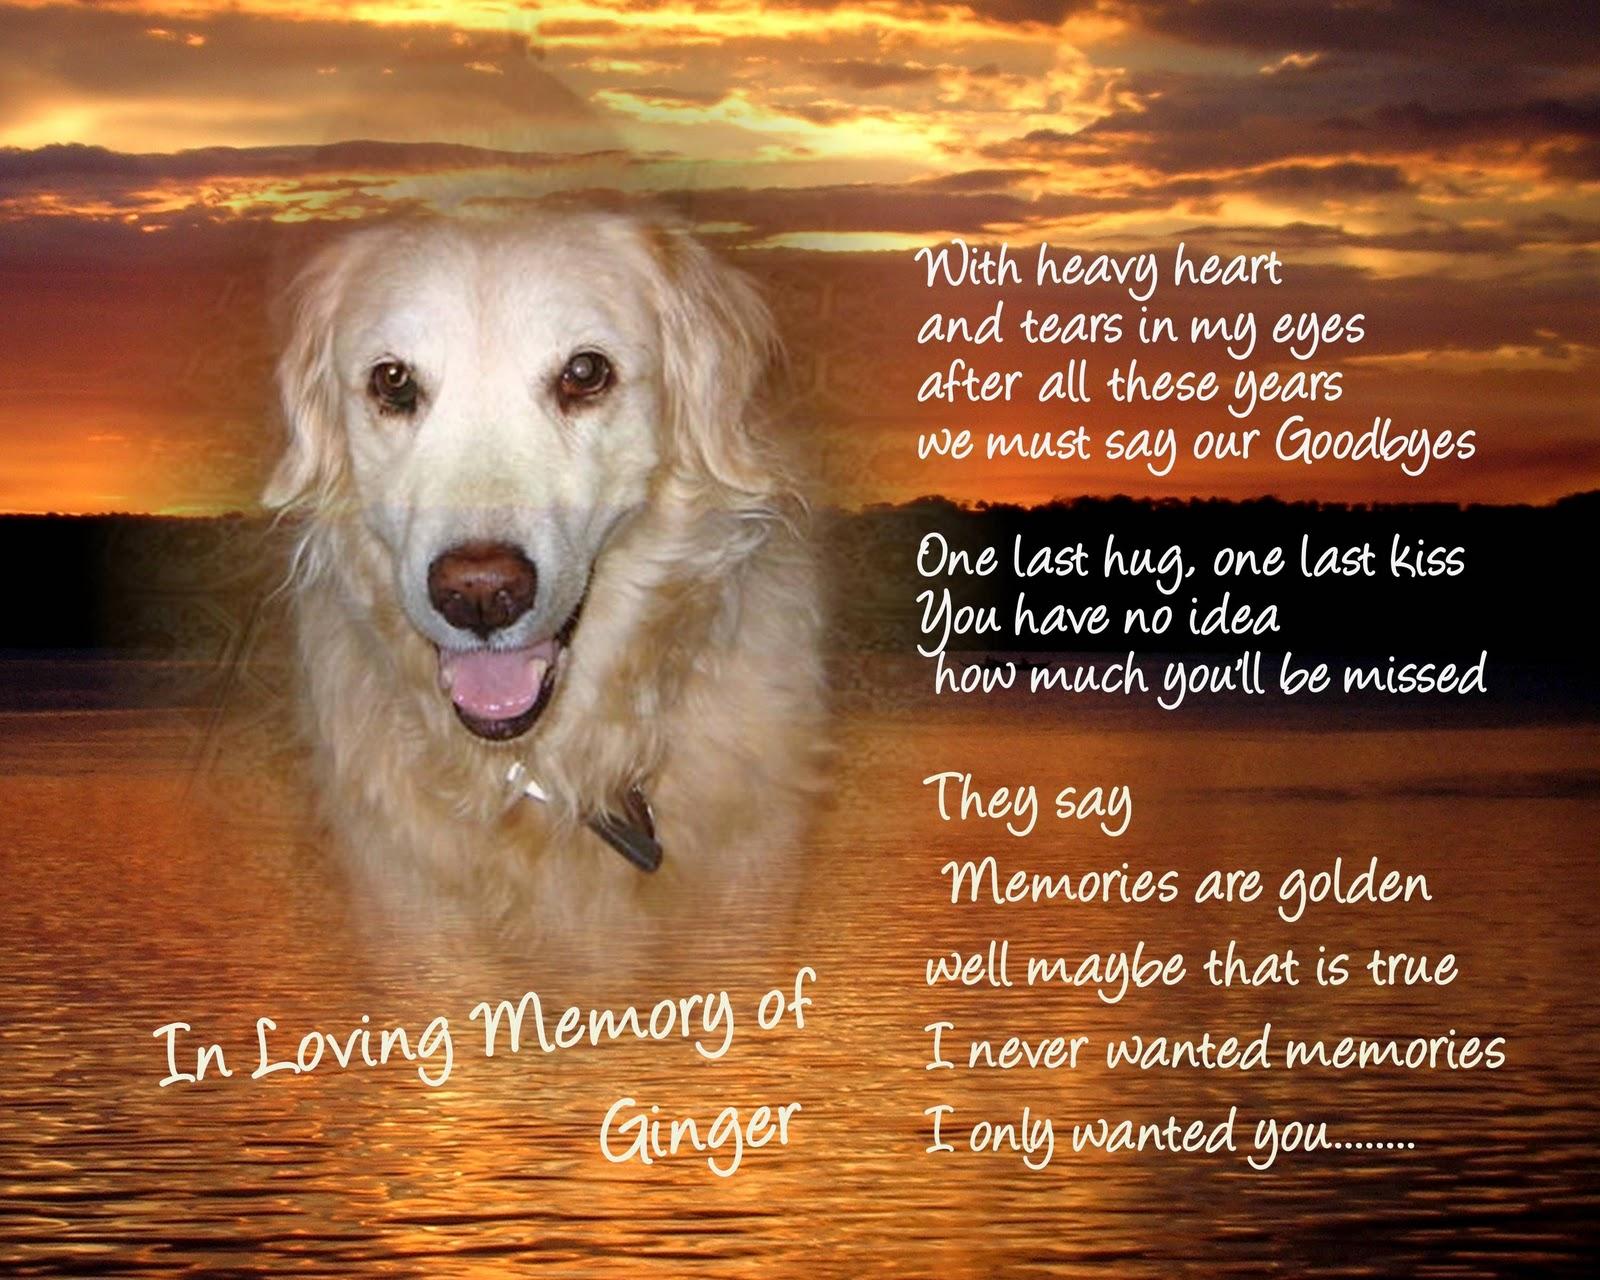 Headstone Sayings For Dog